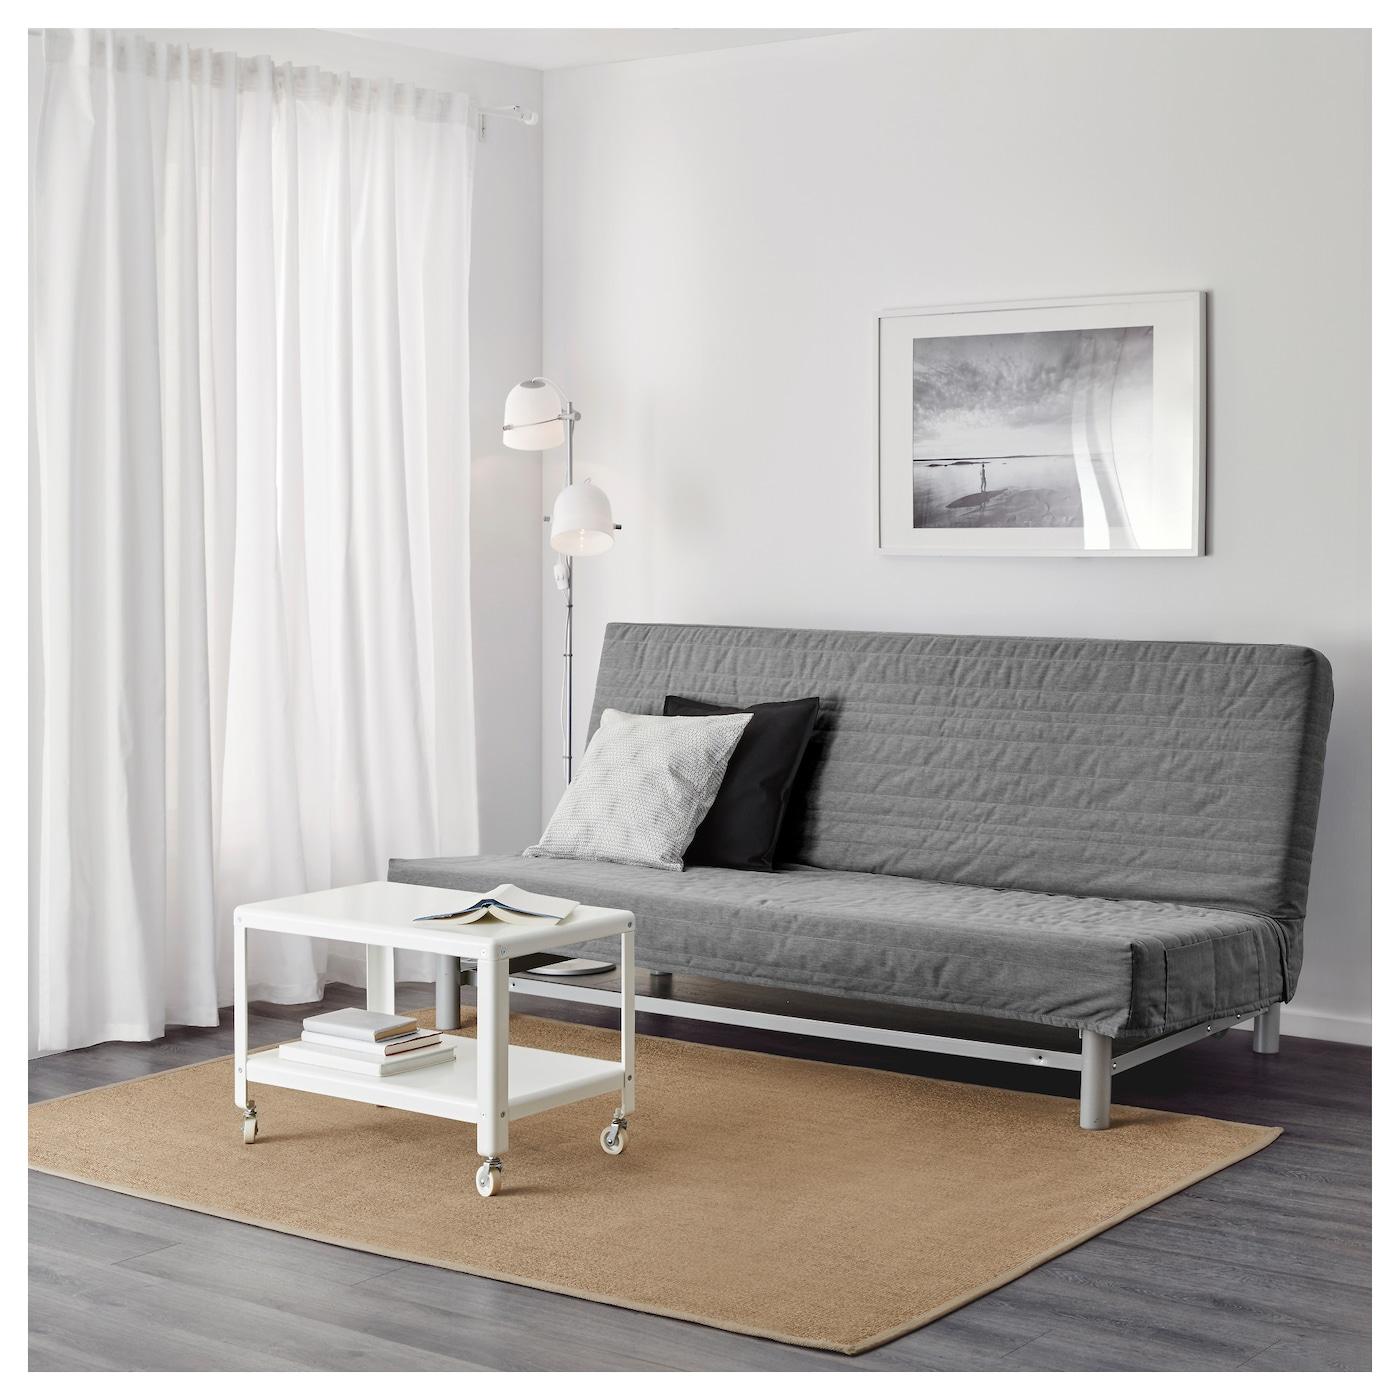 BEDDINGE L214V197S Three seat sofa bed Knisa light grey IKEA : beddinge lC3B6vC3A5s three seat sofa bed knisa light grey0451303pe600328s5 from www.ikea.com size 2000 x 2000 jpeg 637kB